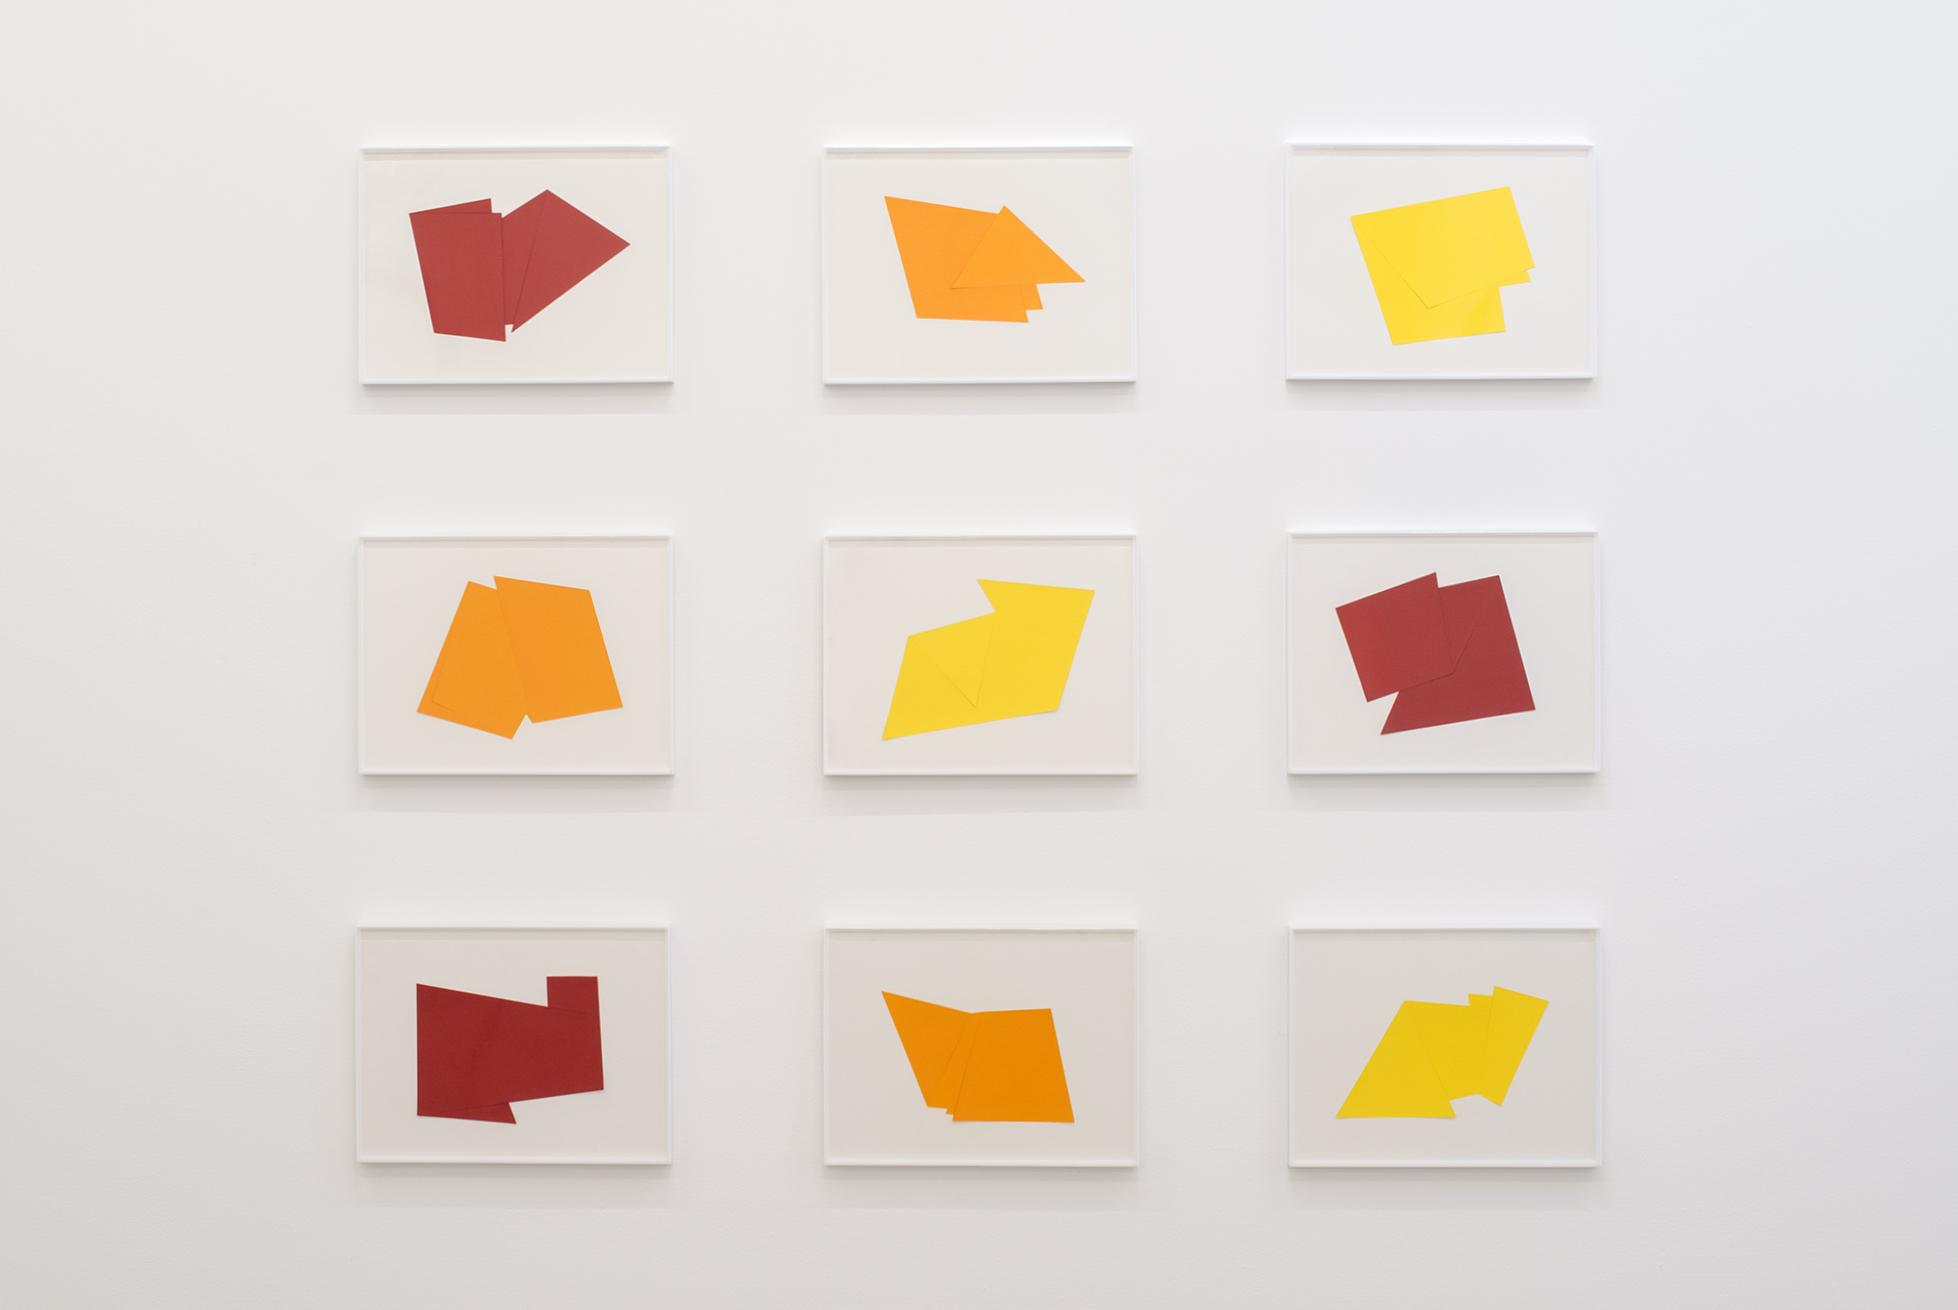 Relevo bidimensional (2015) - Mauro Piva